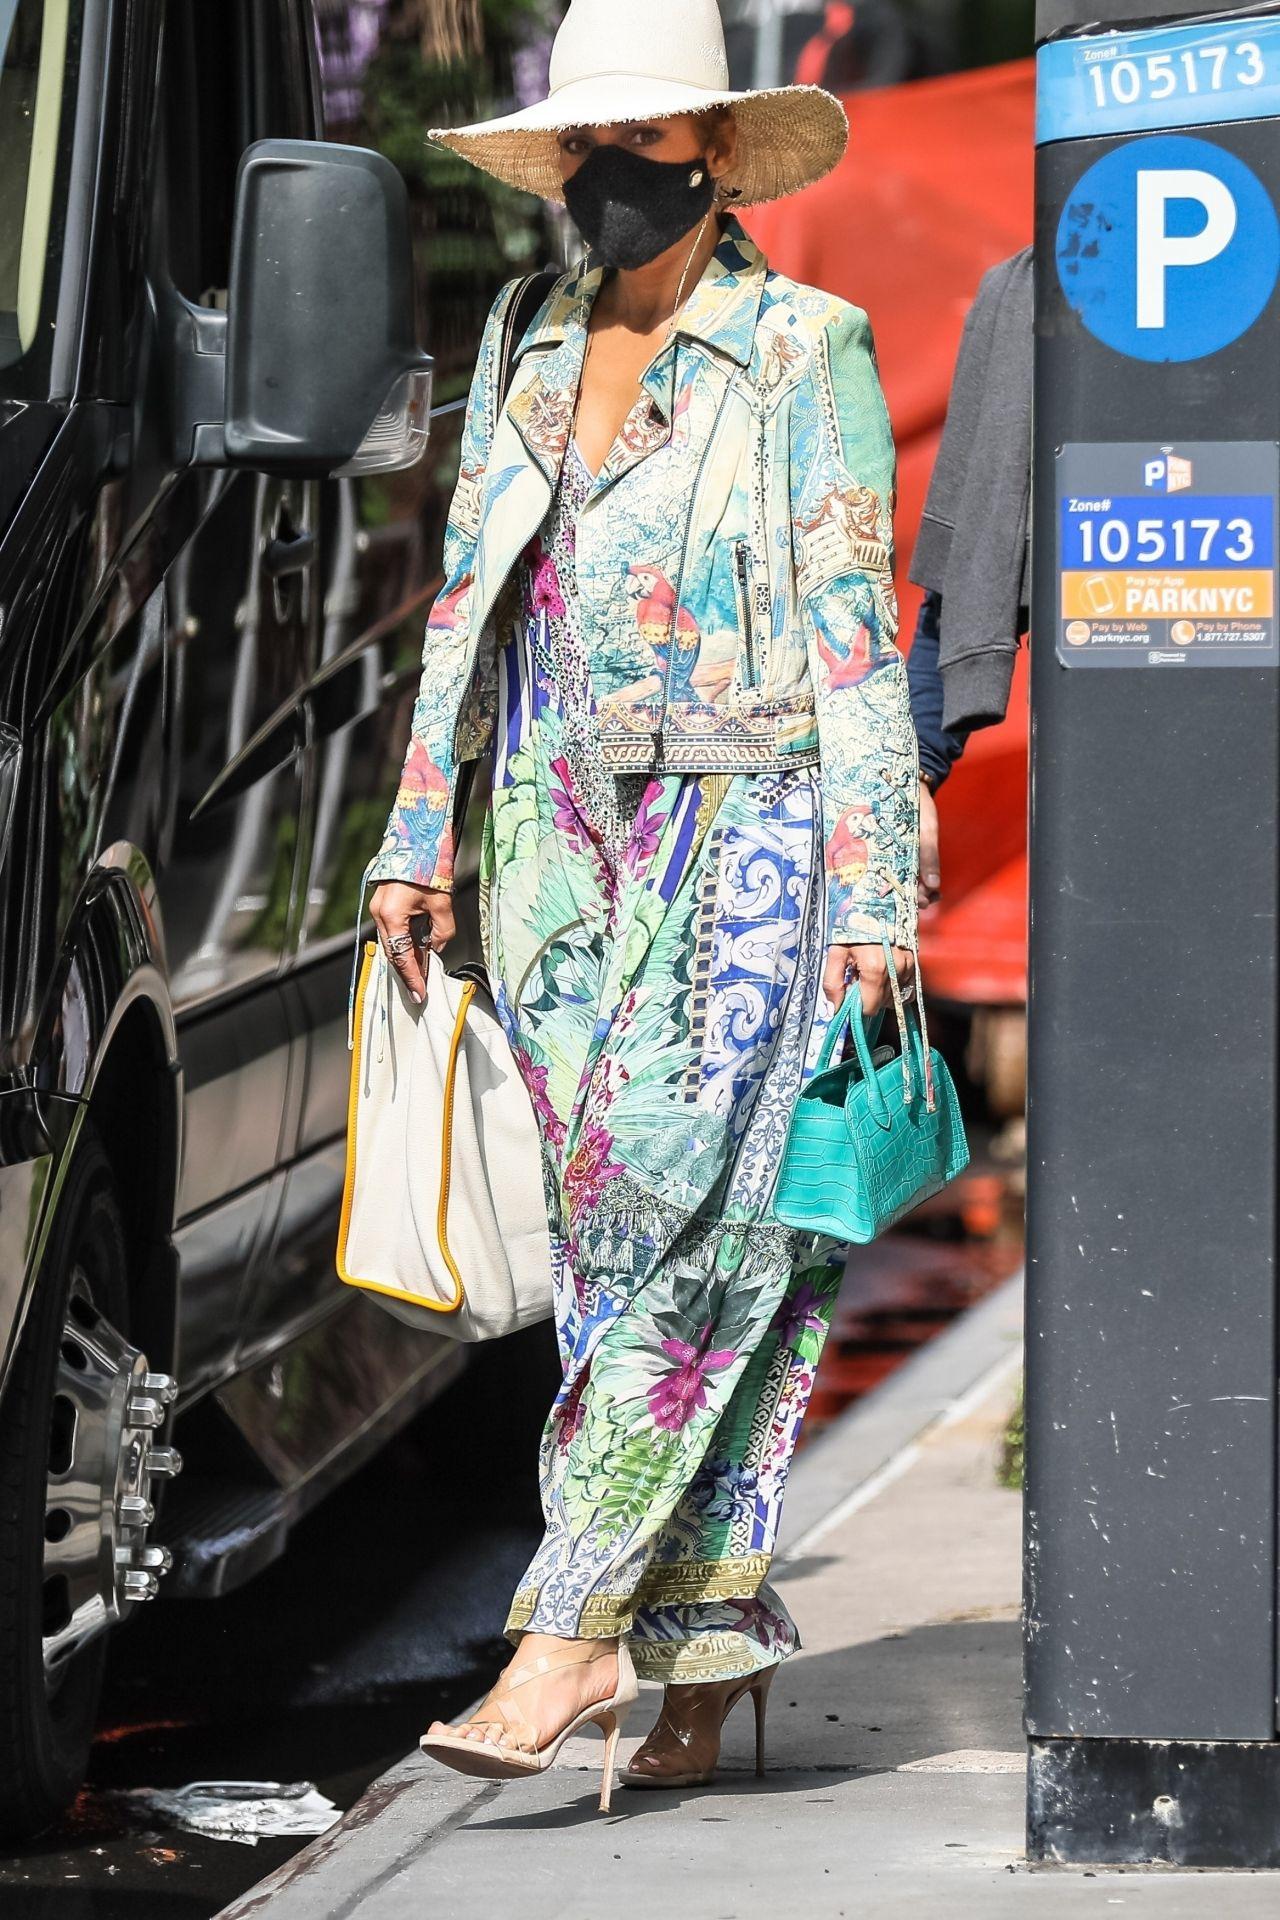 jennifer-lopez-in-floral-motorcycle-jacket-floral-maxi-dress